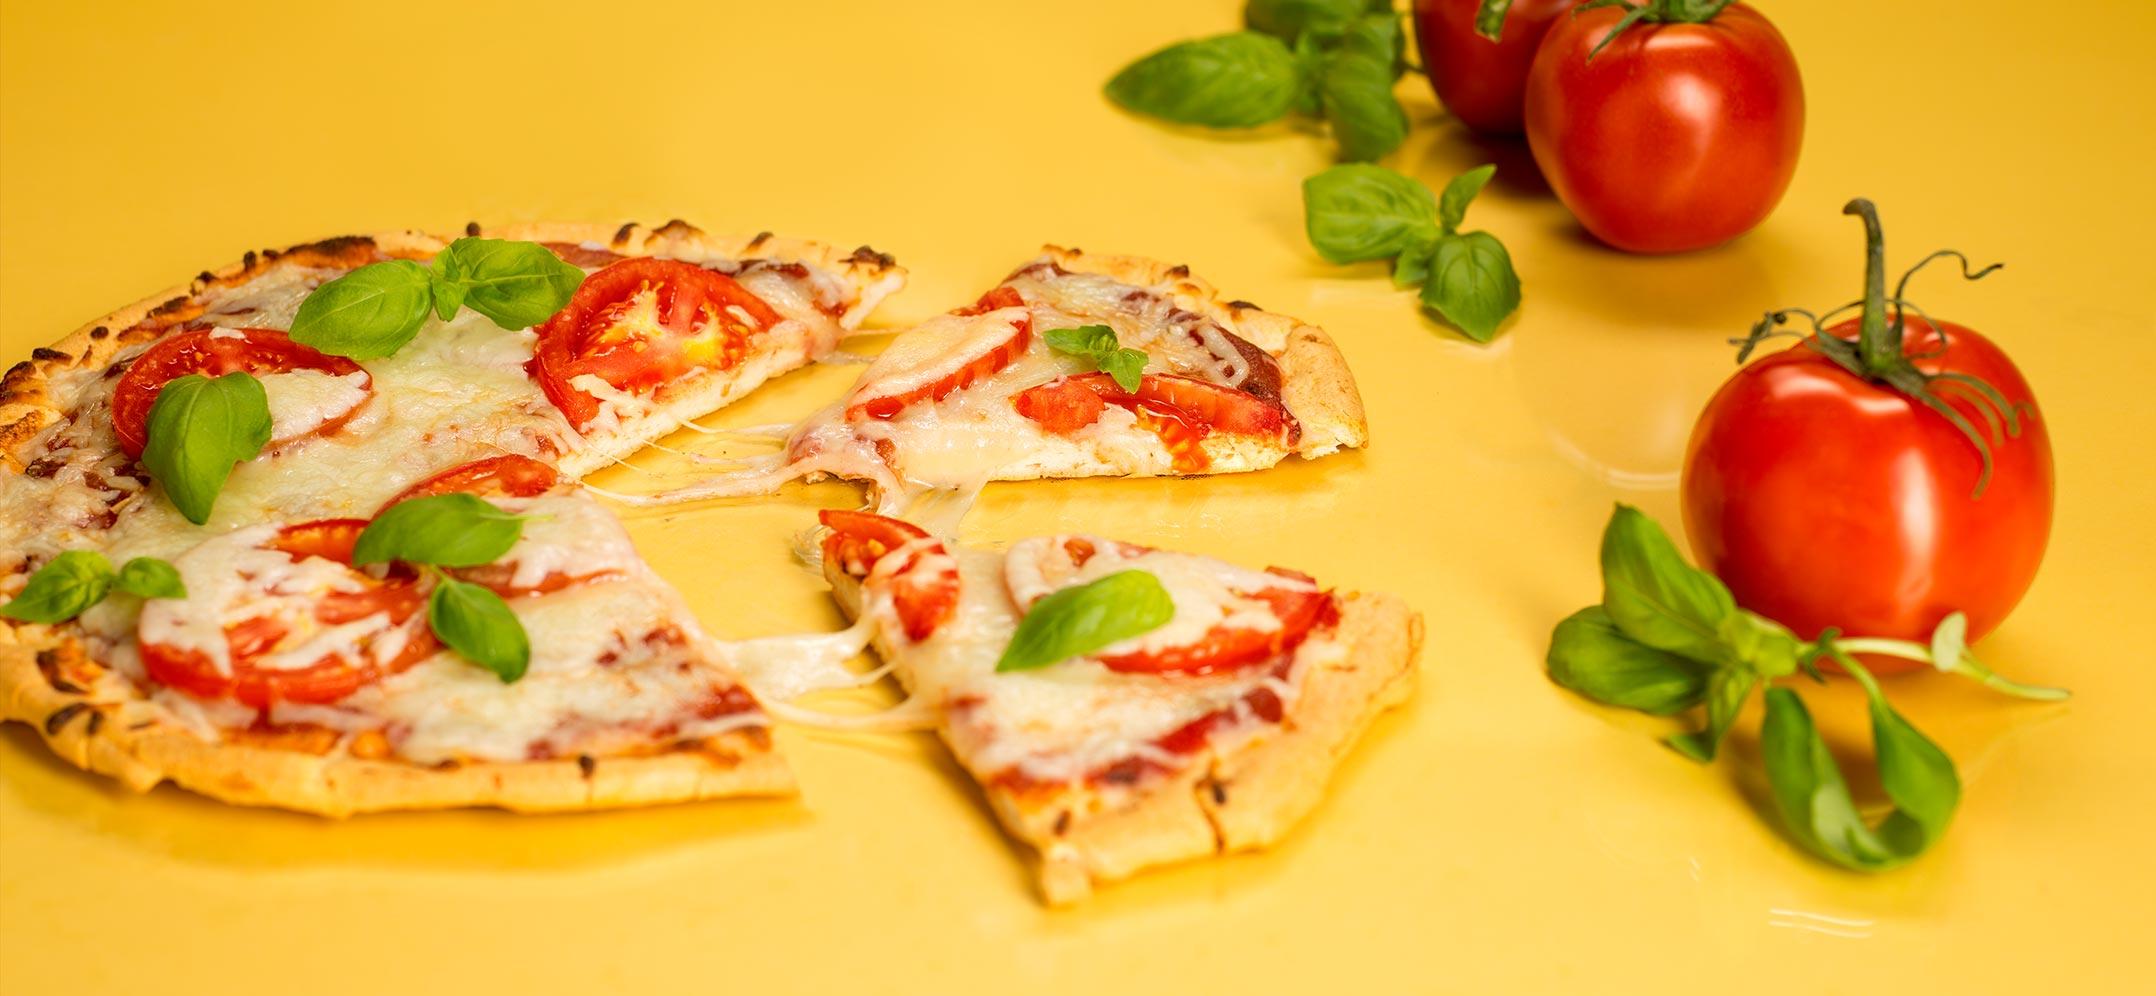 torino pizza telefonnummer